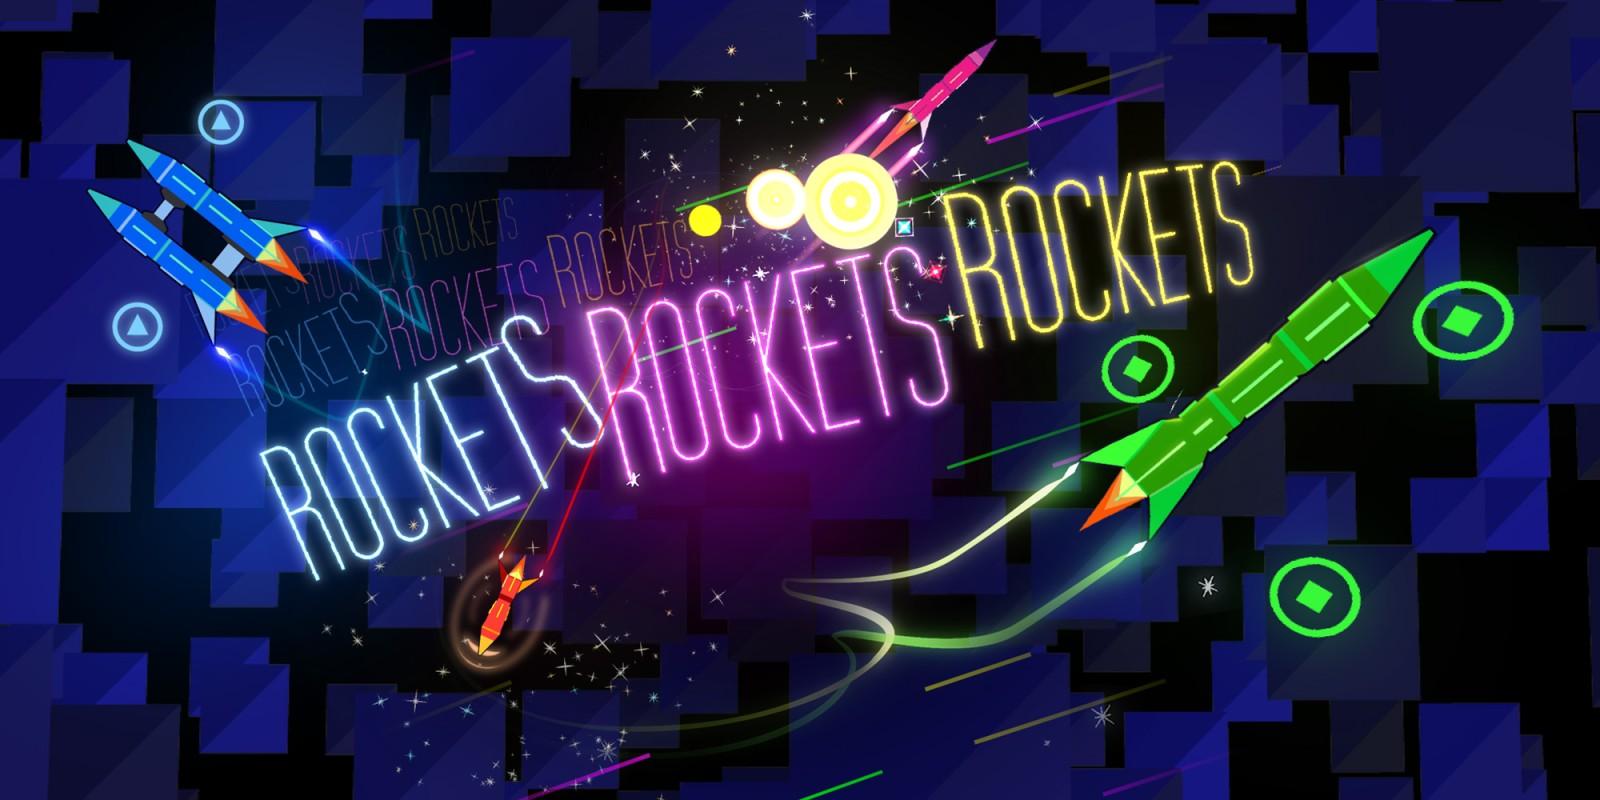 ROCKETSROCKETSROCKETS | Nintendo Switch download software